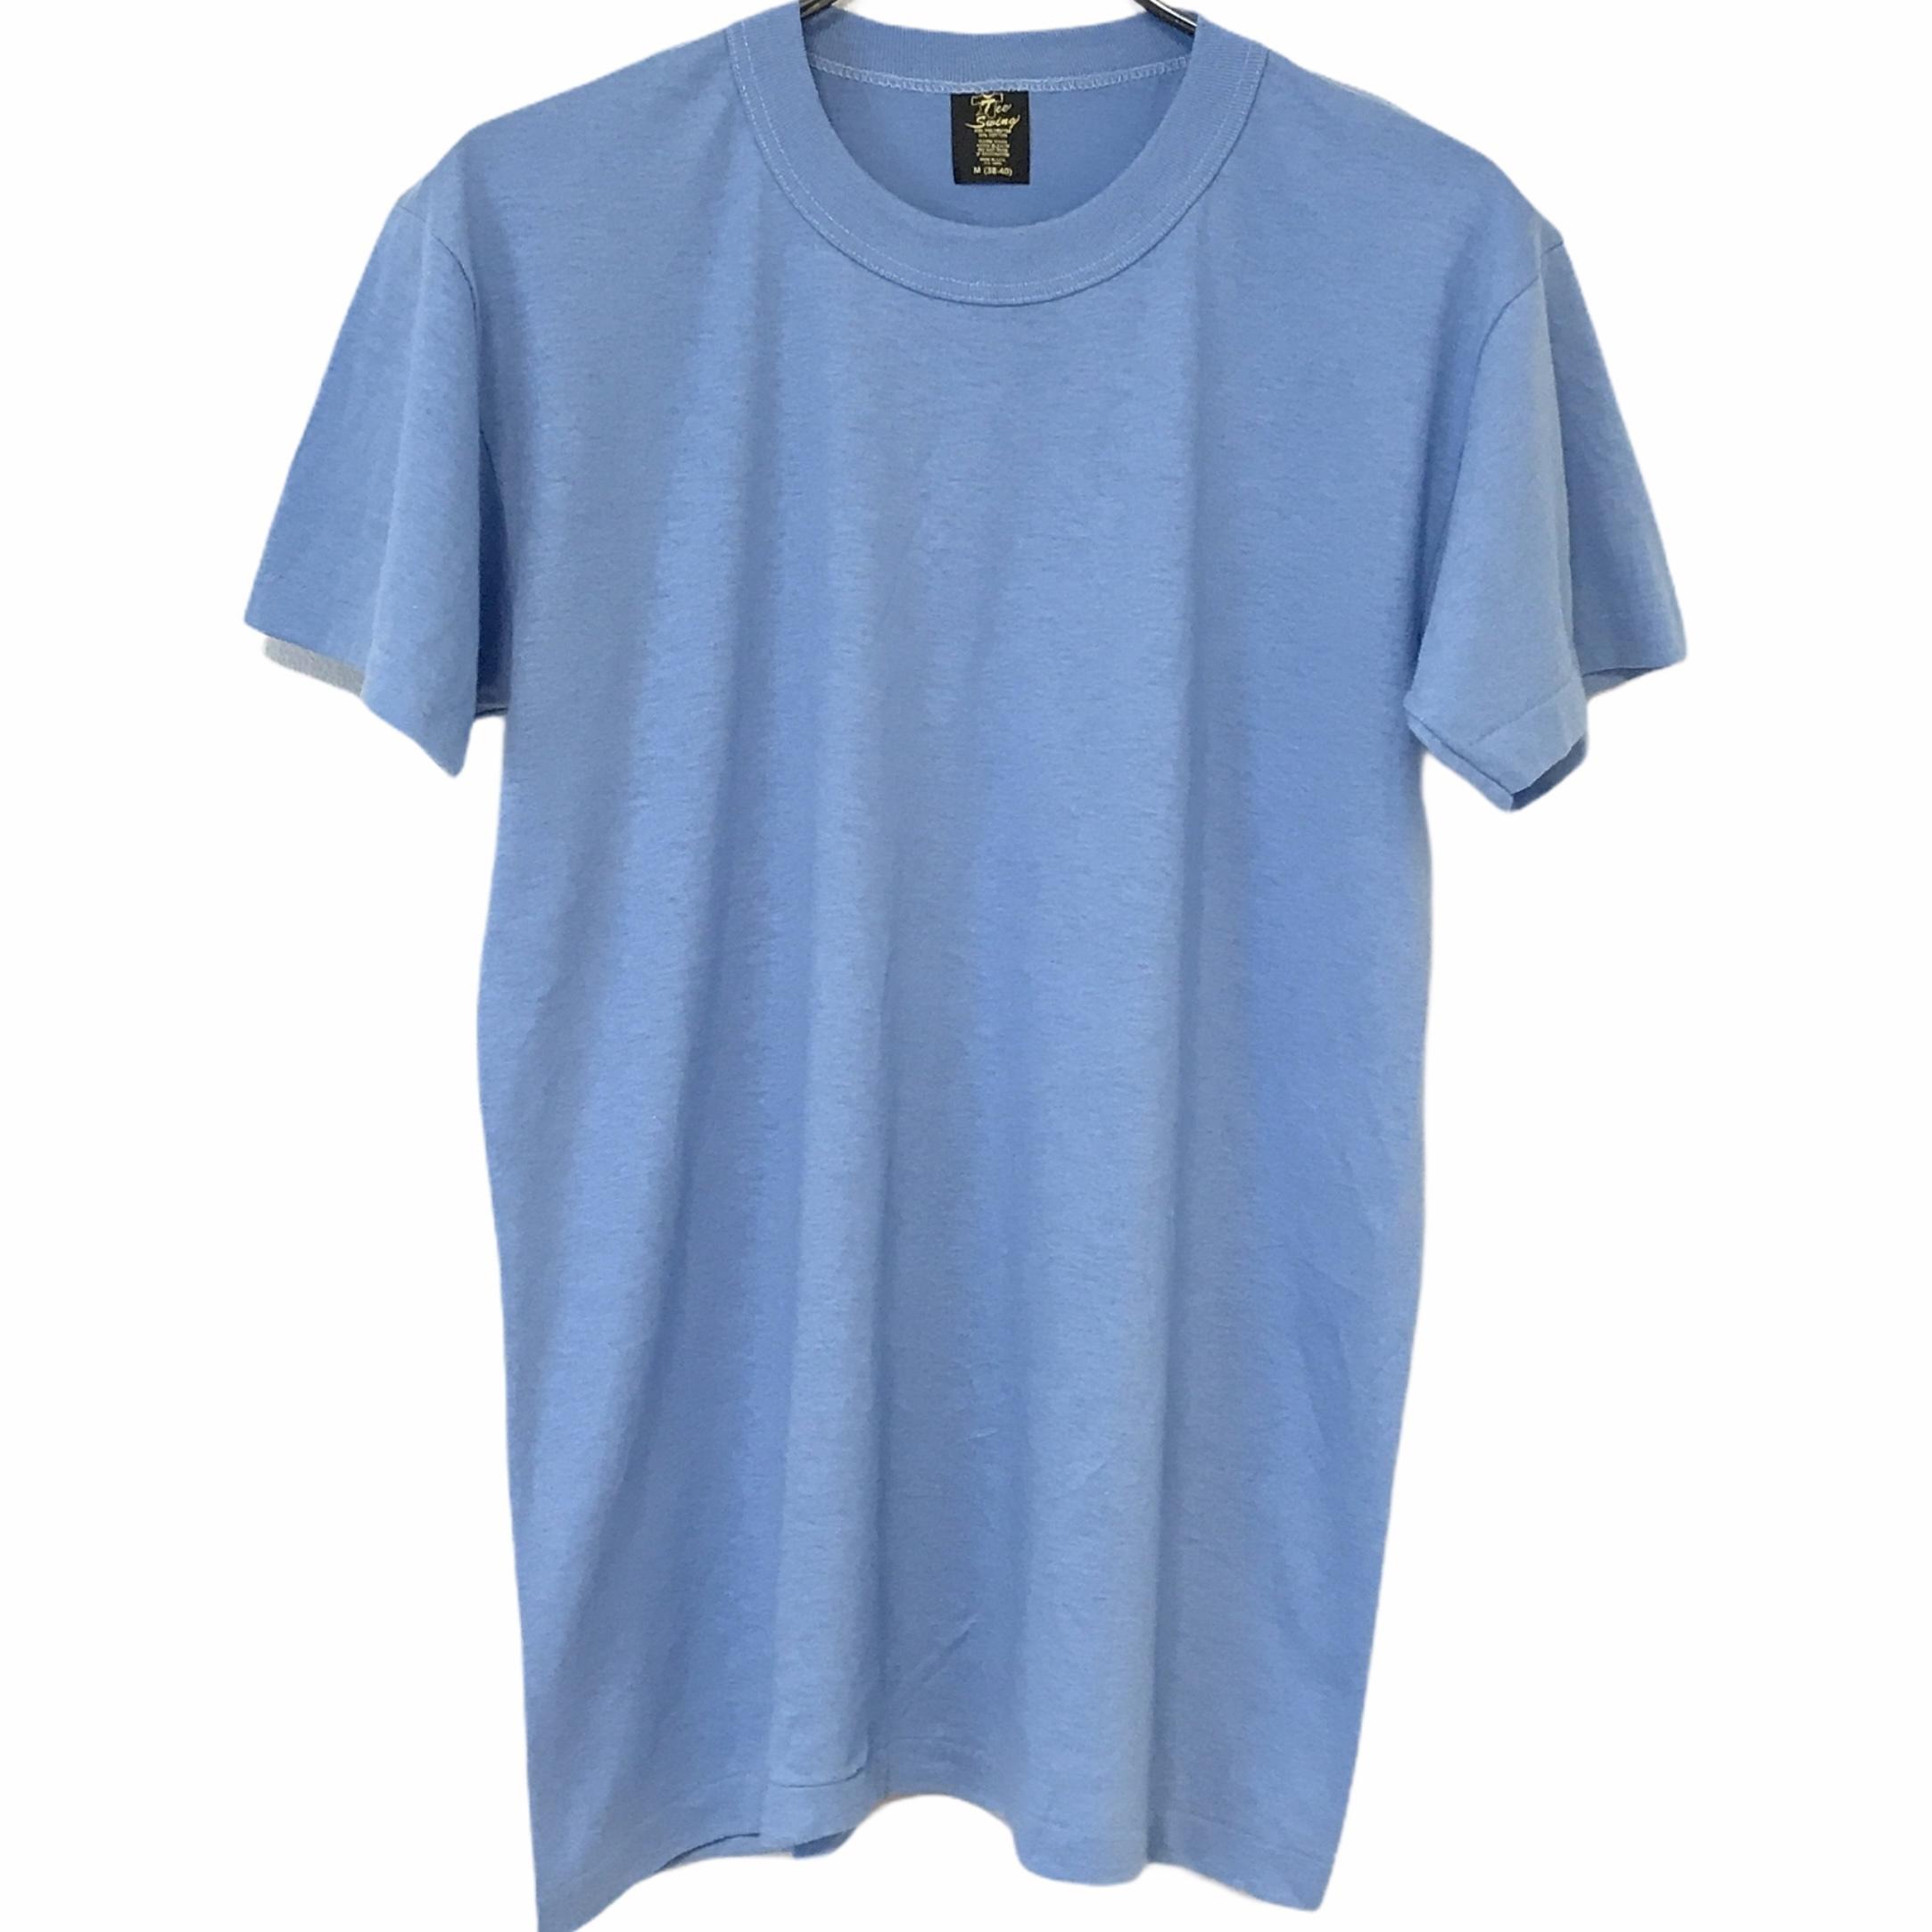 Dead Stock! 80's Tee Swing T-shirt made in USA Light Blue